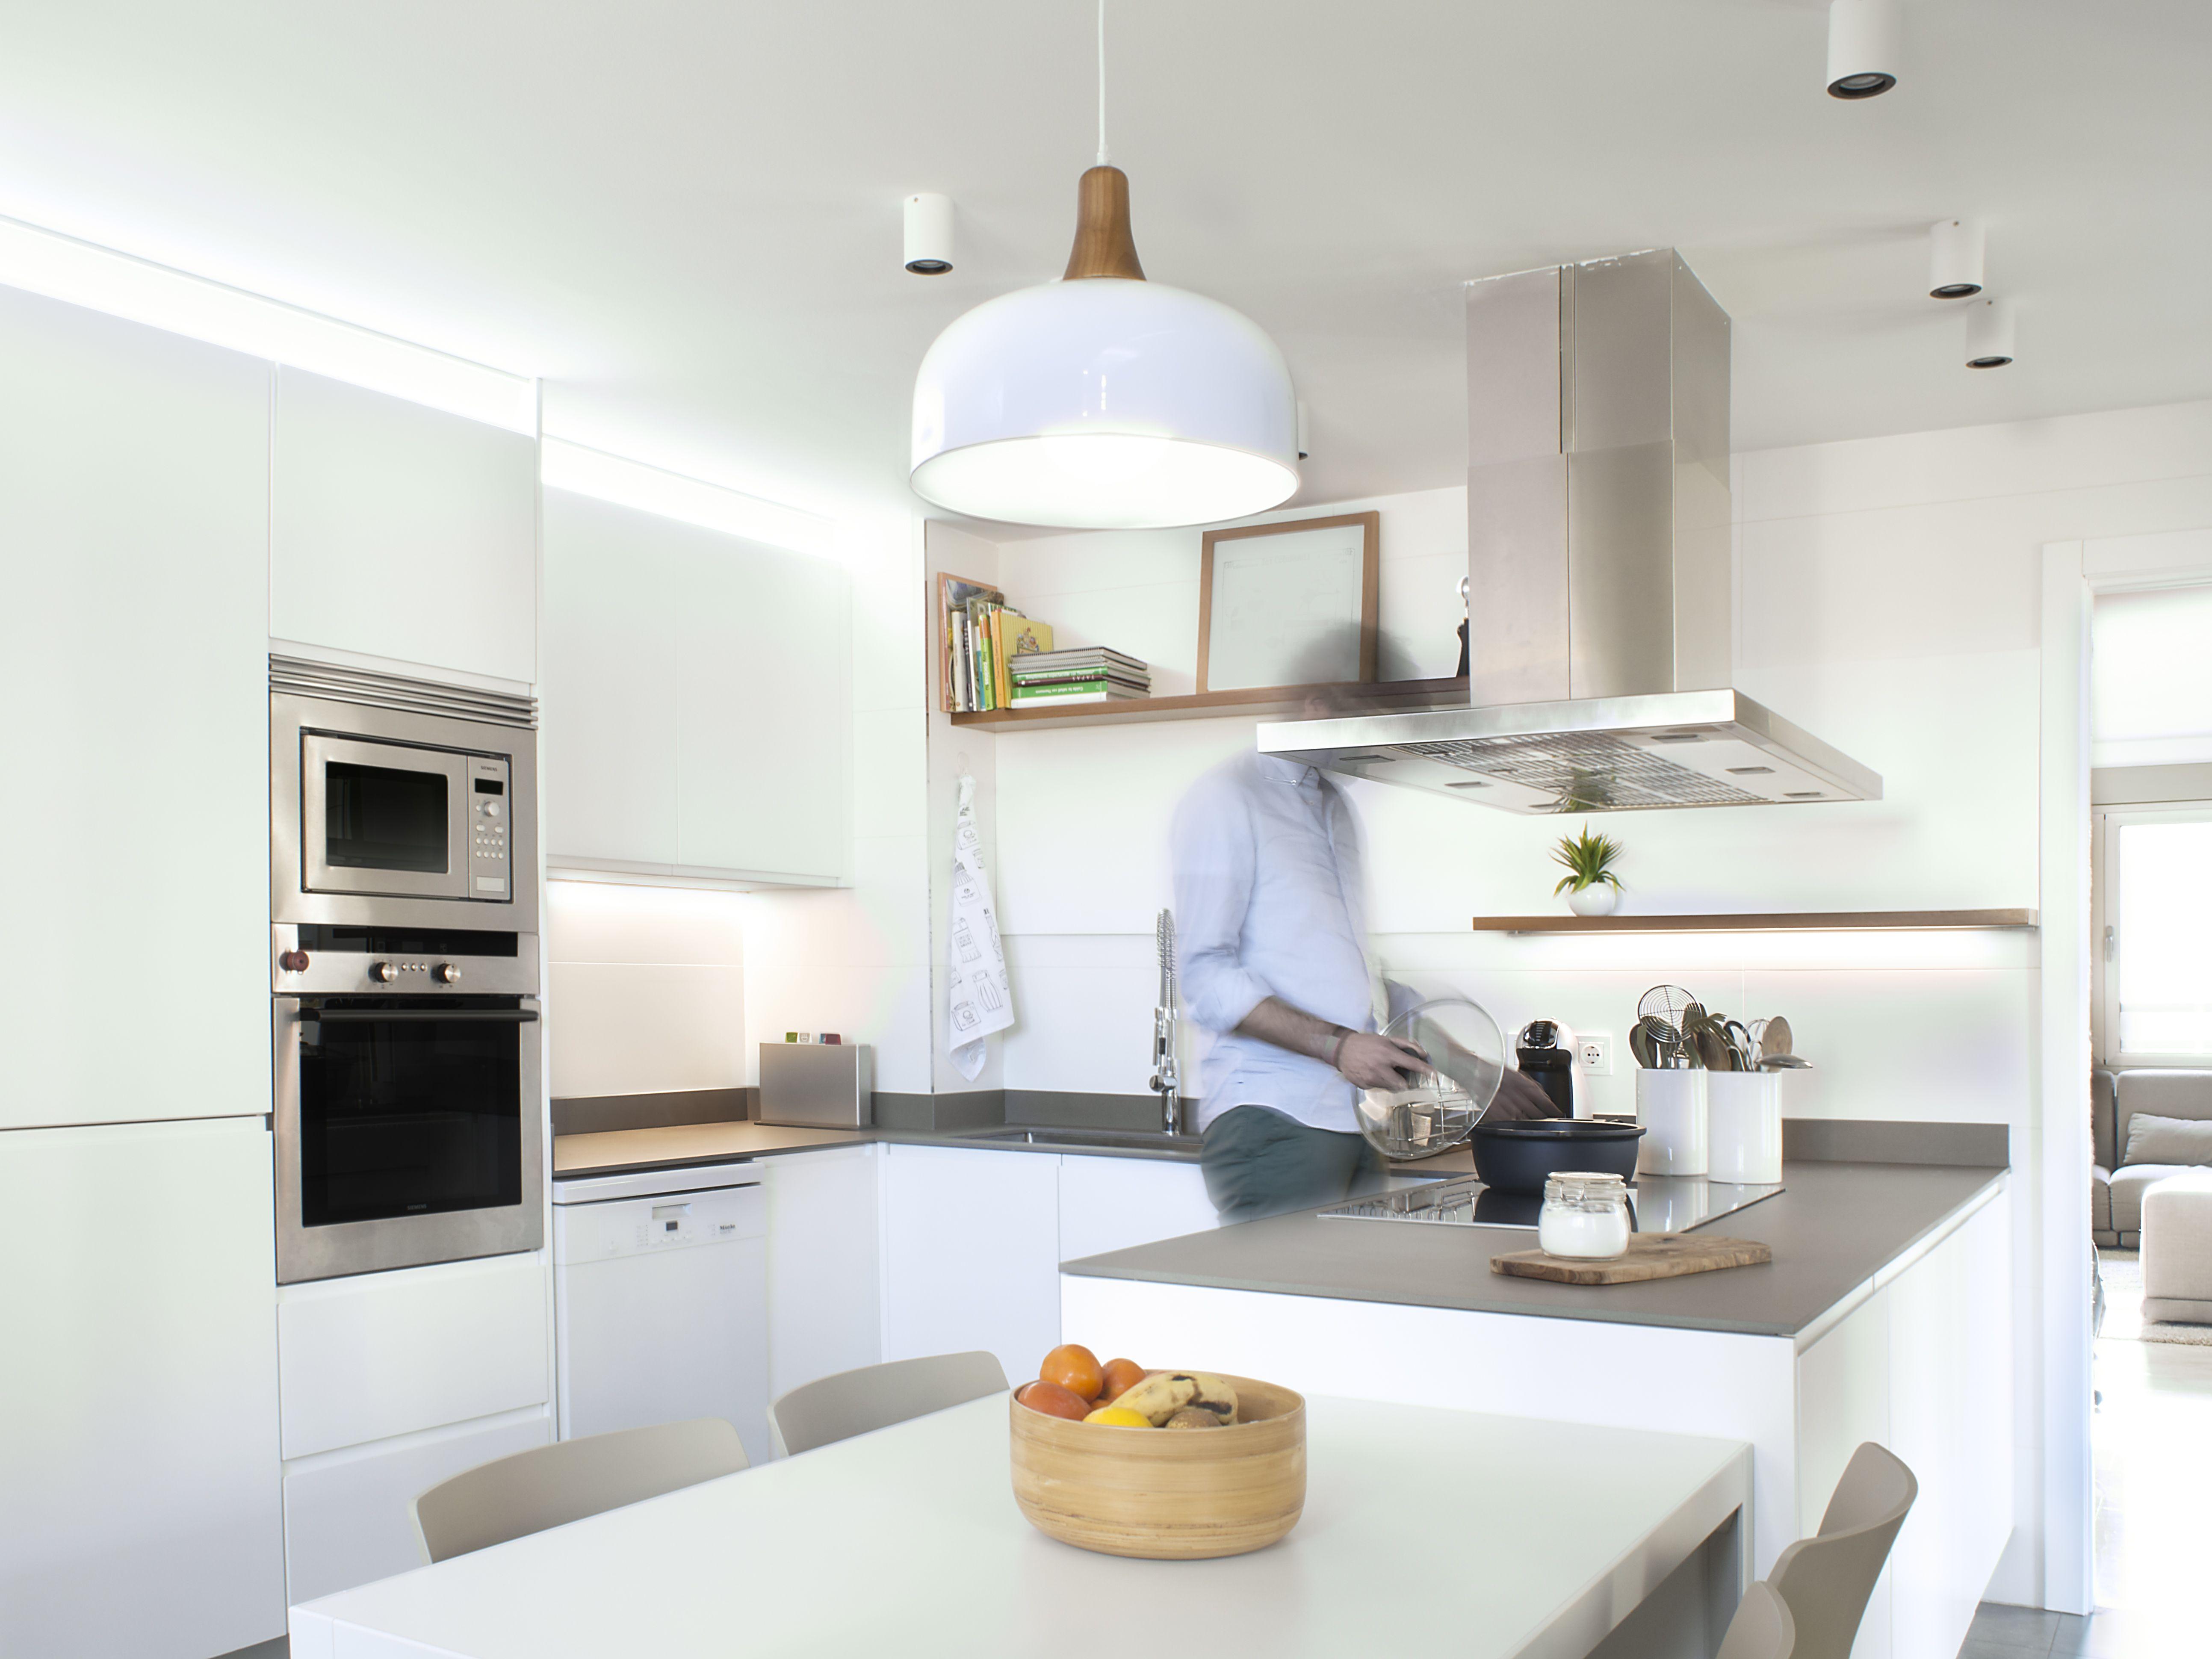 Cocina vivienda. Mobiliario a medida diseñado por KALEIDOSCOPE ...